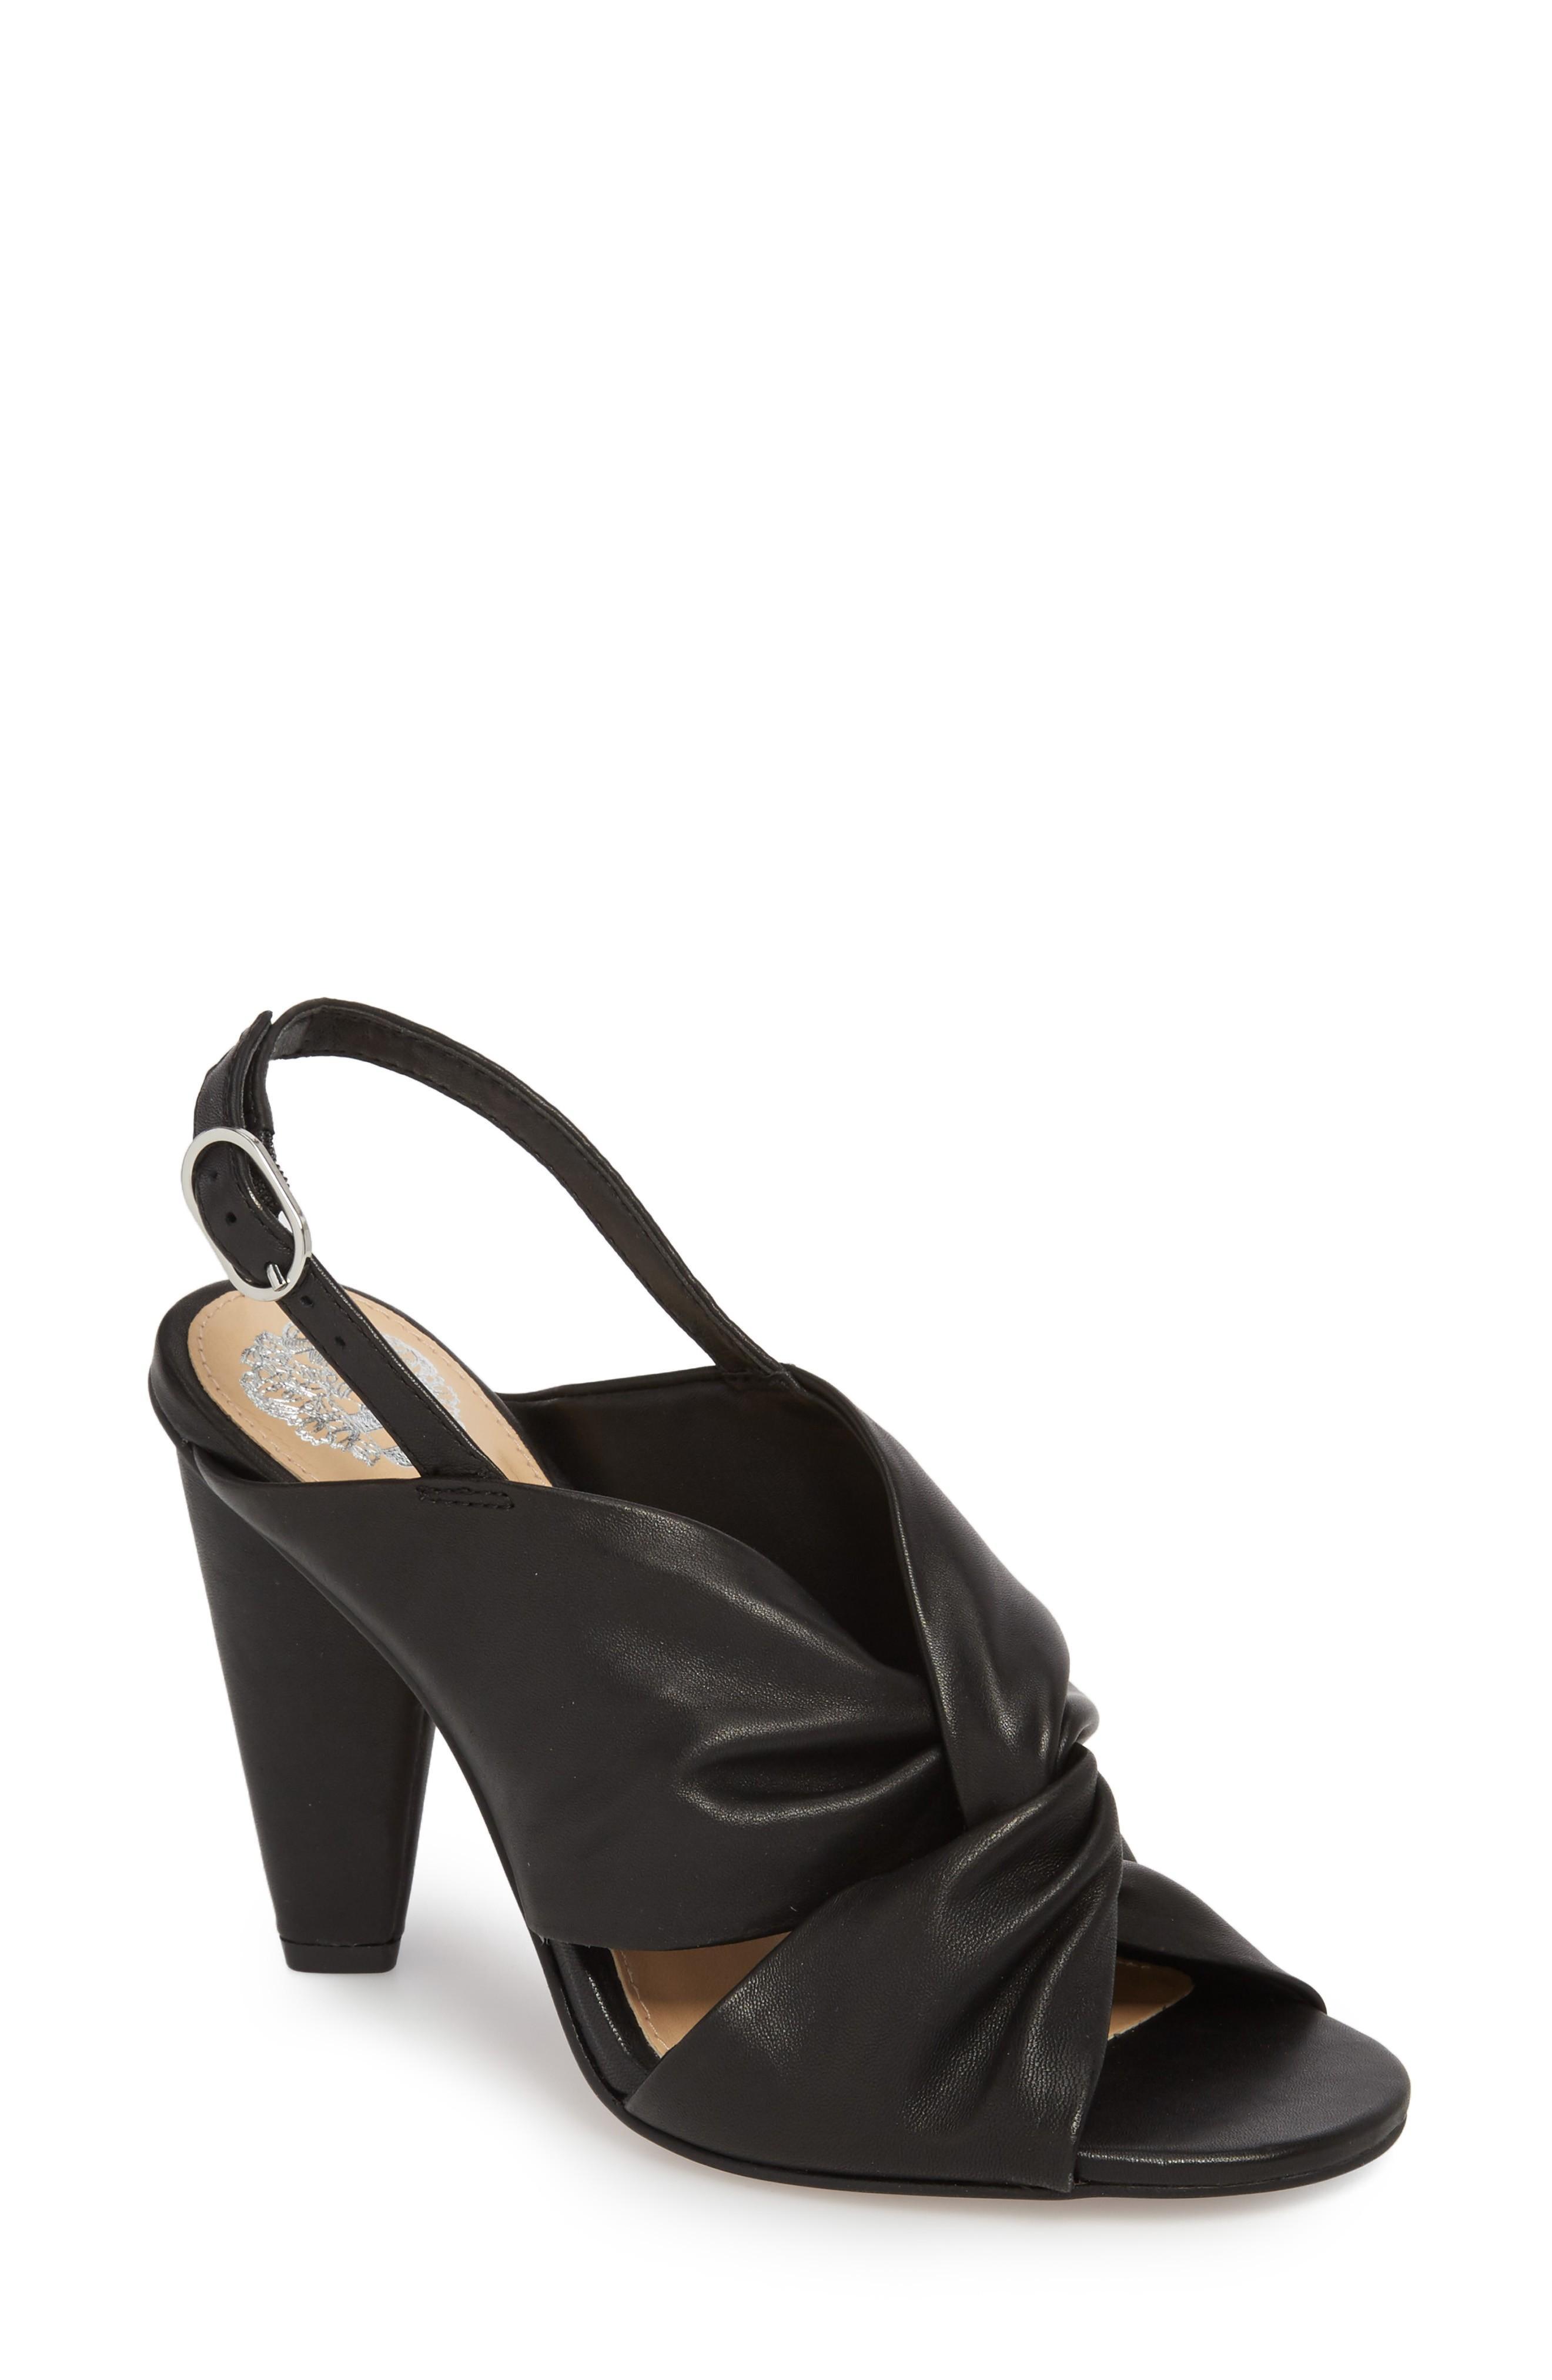 Vince Camuto Kattie Slingback Sandal In Black Leather